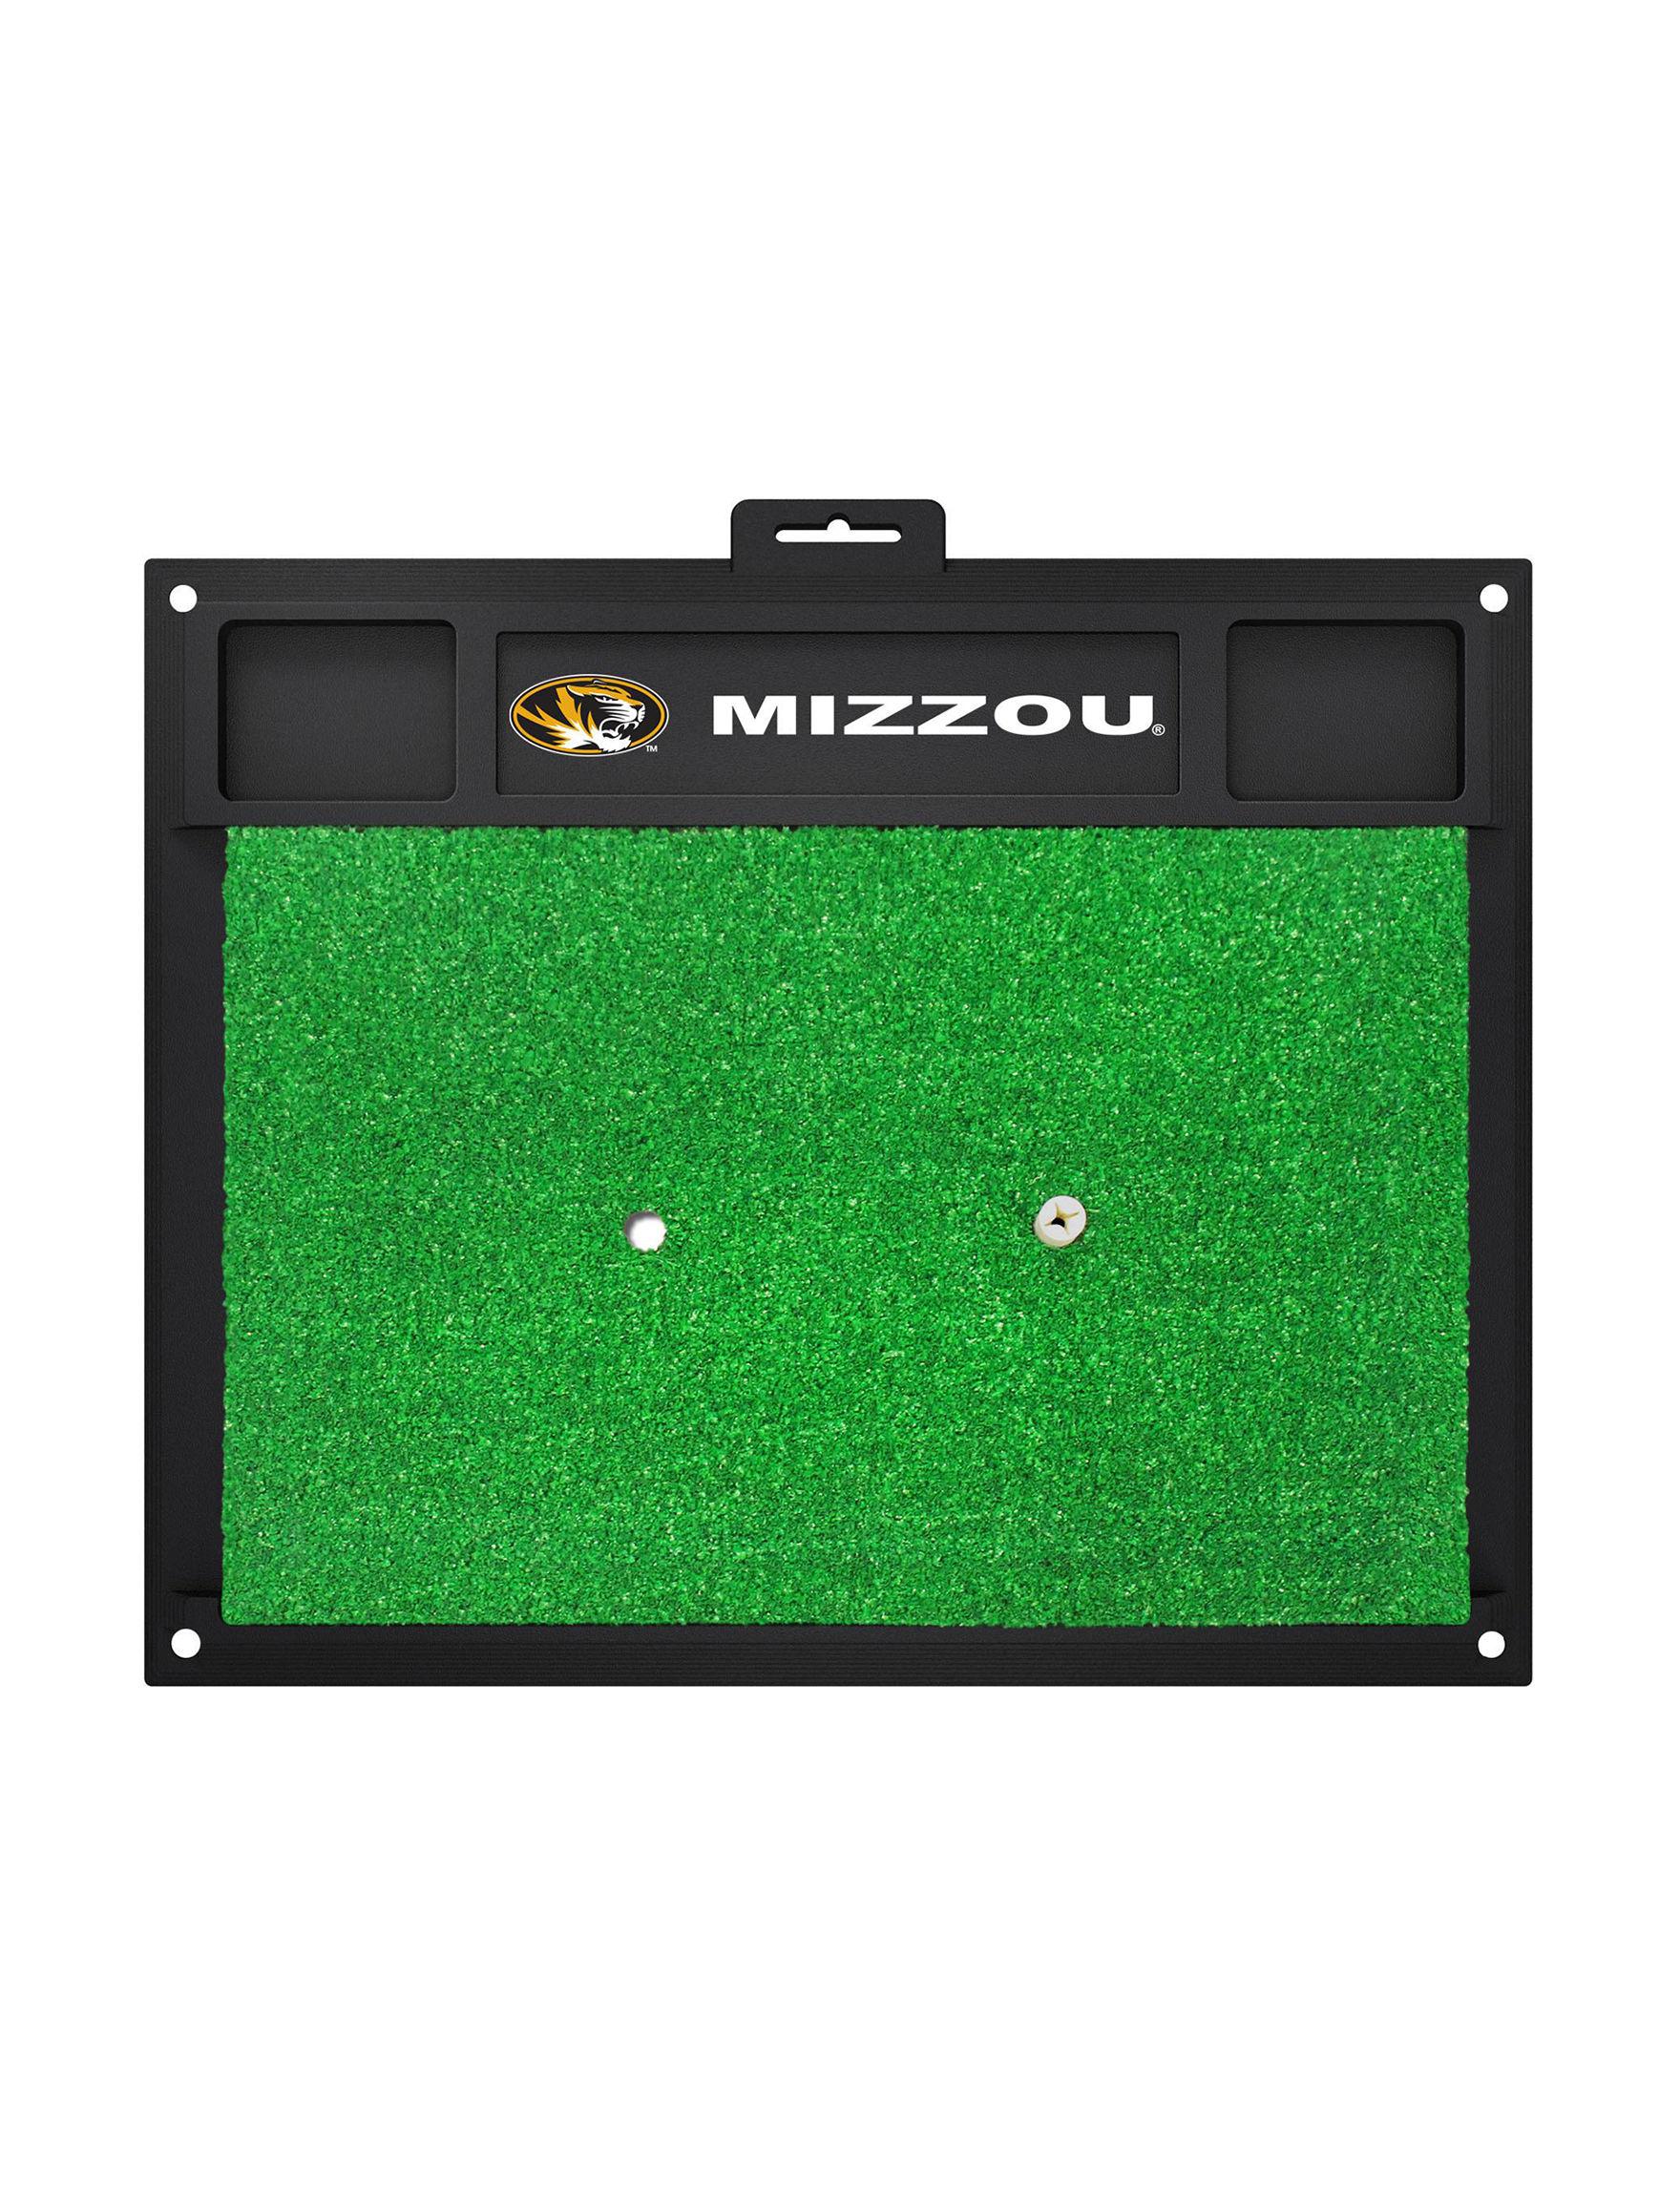 Fanmats Black / Gold Outdoor Rugs & Doormats Outdoor Decor